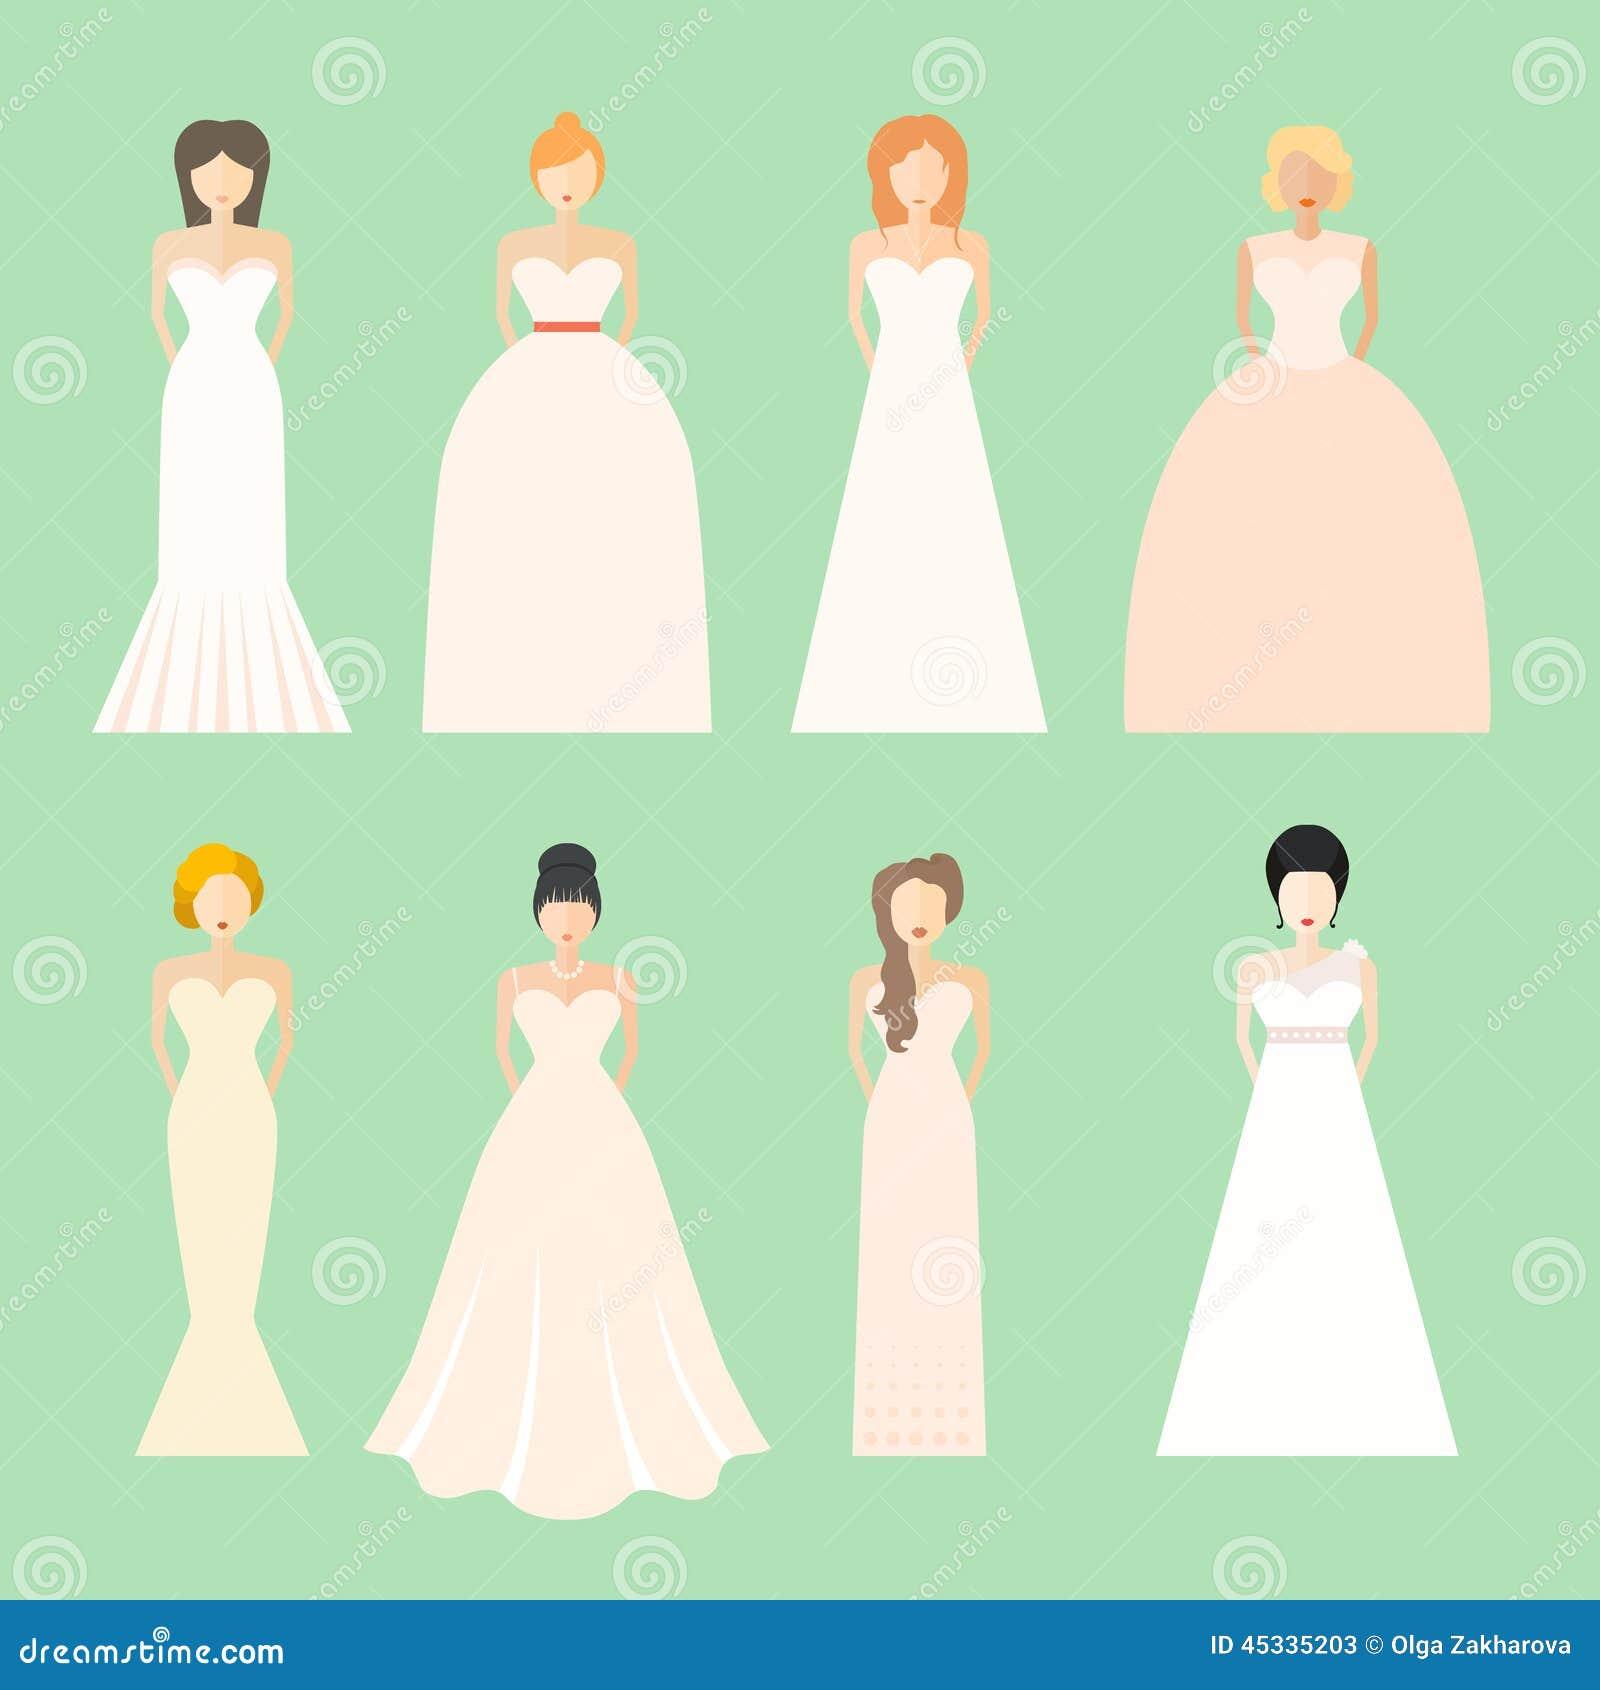 robe de mari e style pour le type de corps peinture